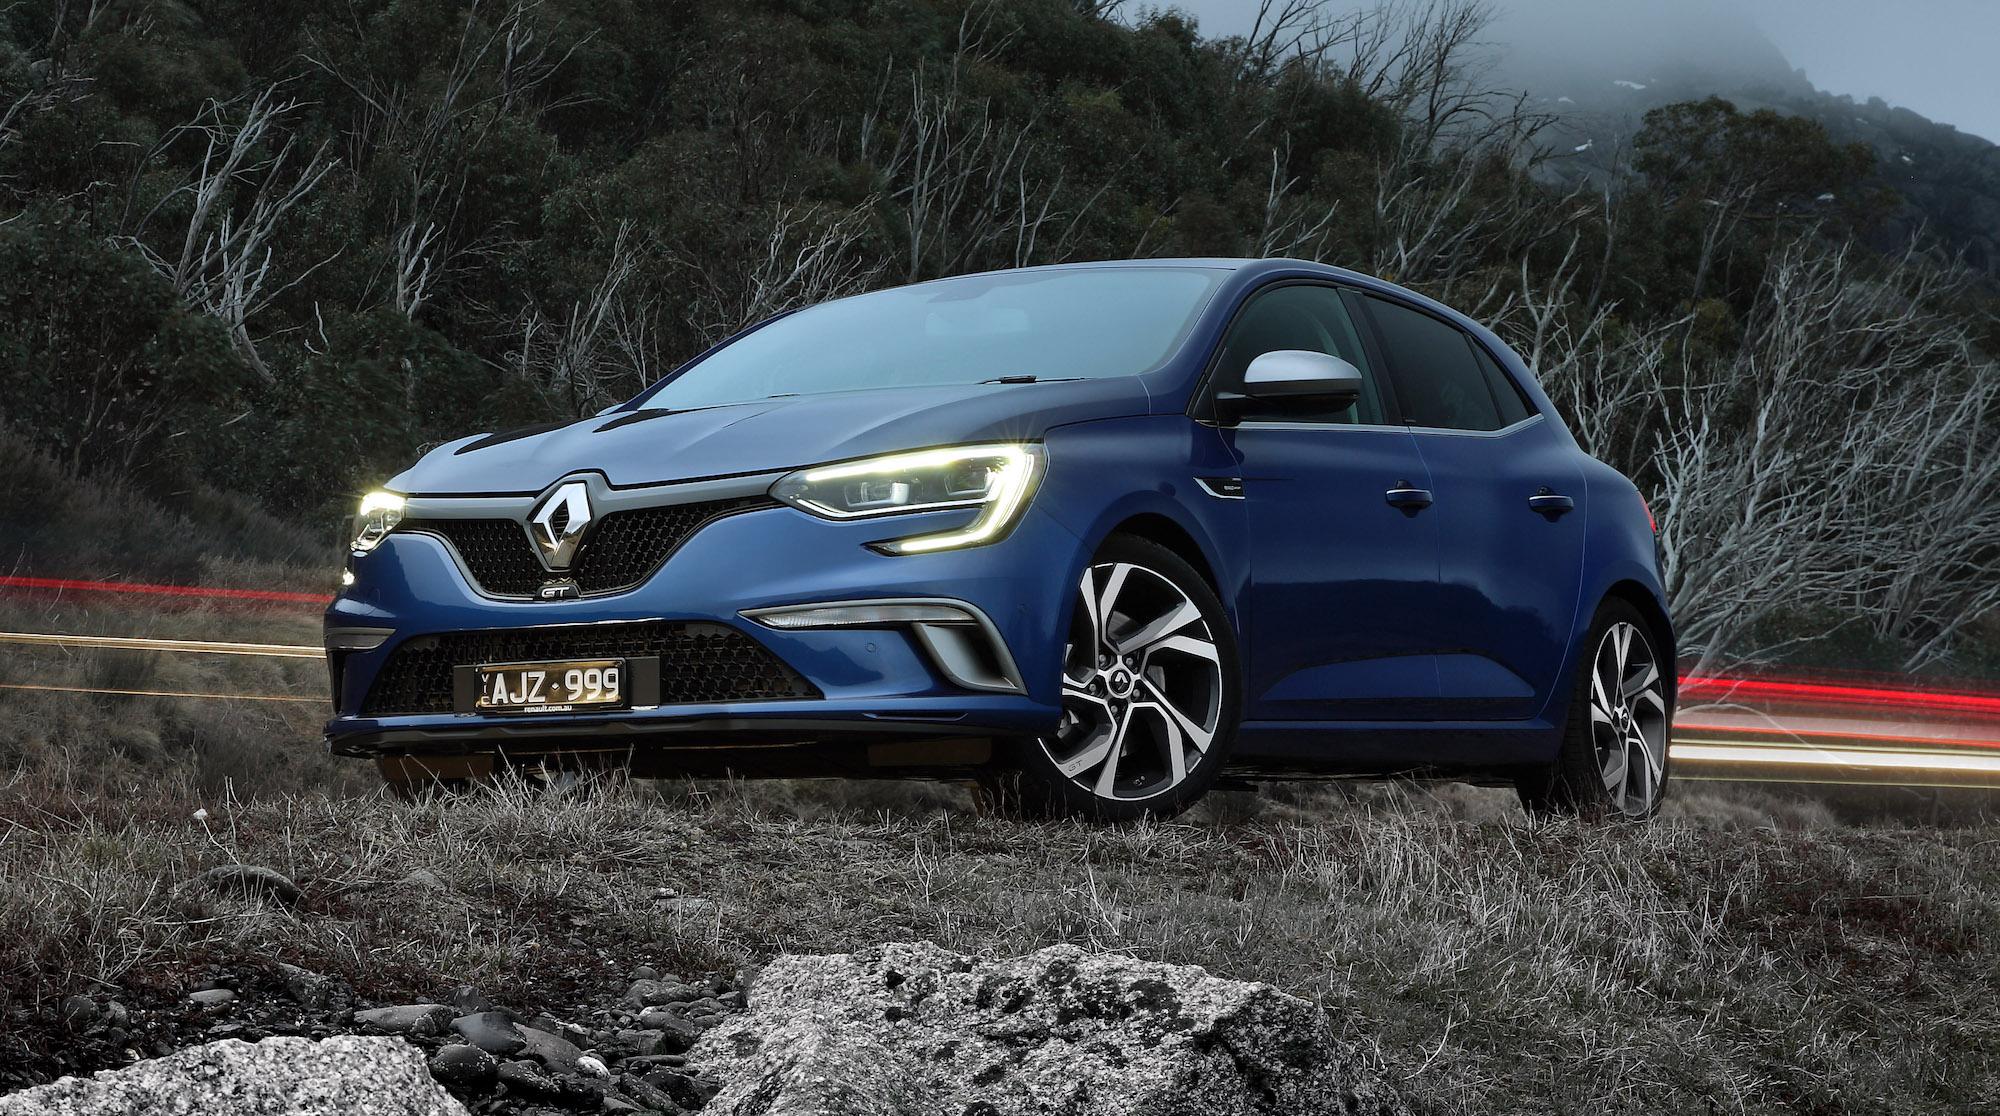 Renault Megane GT photo 170357